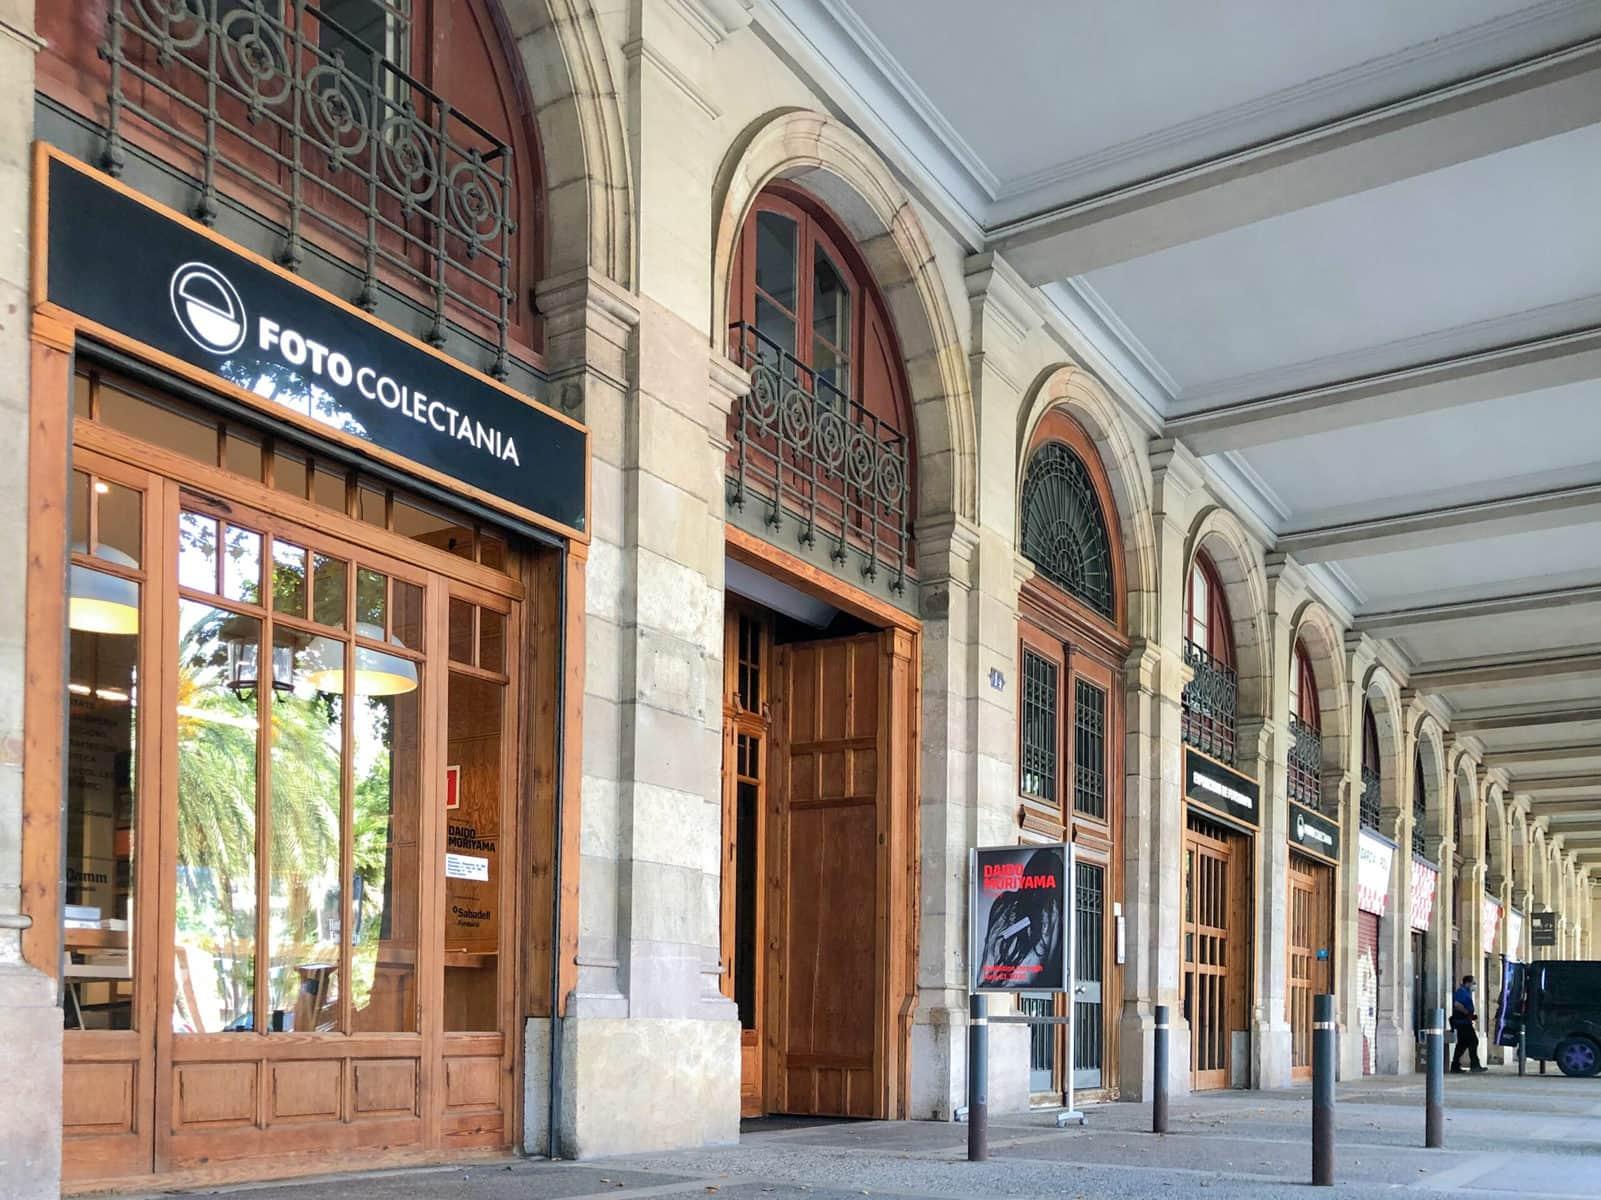 Foto Colectania Barcelona